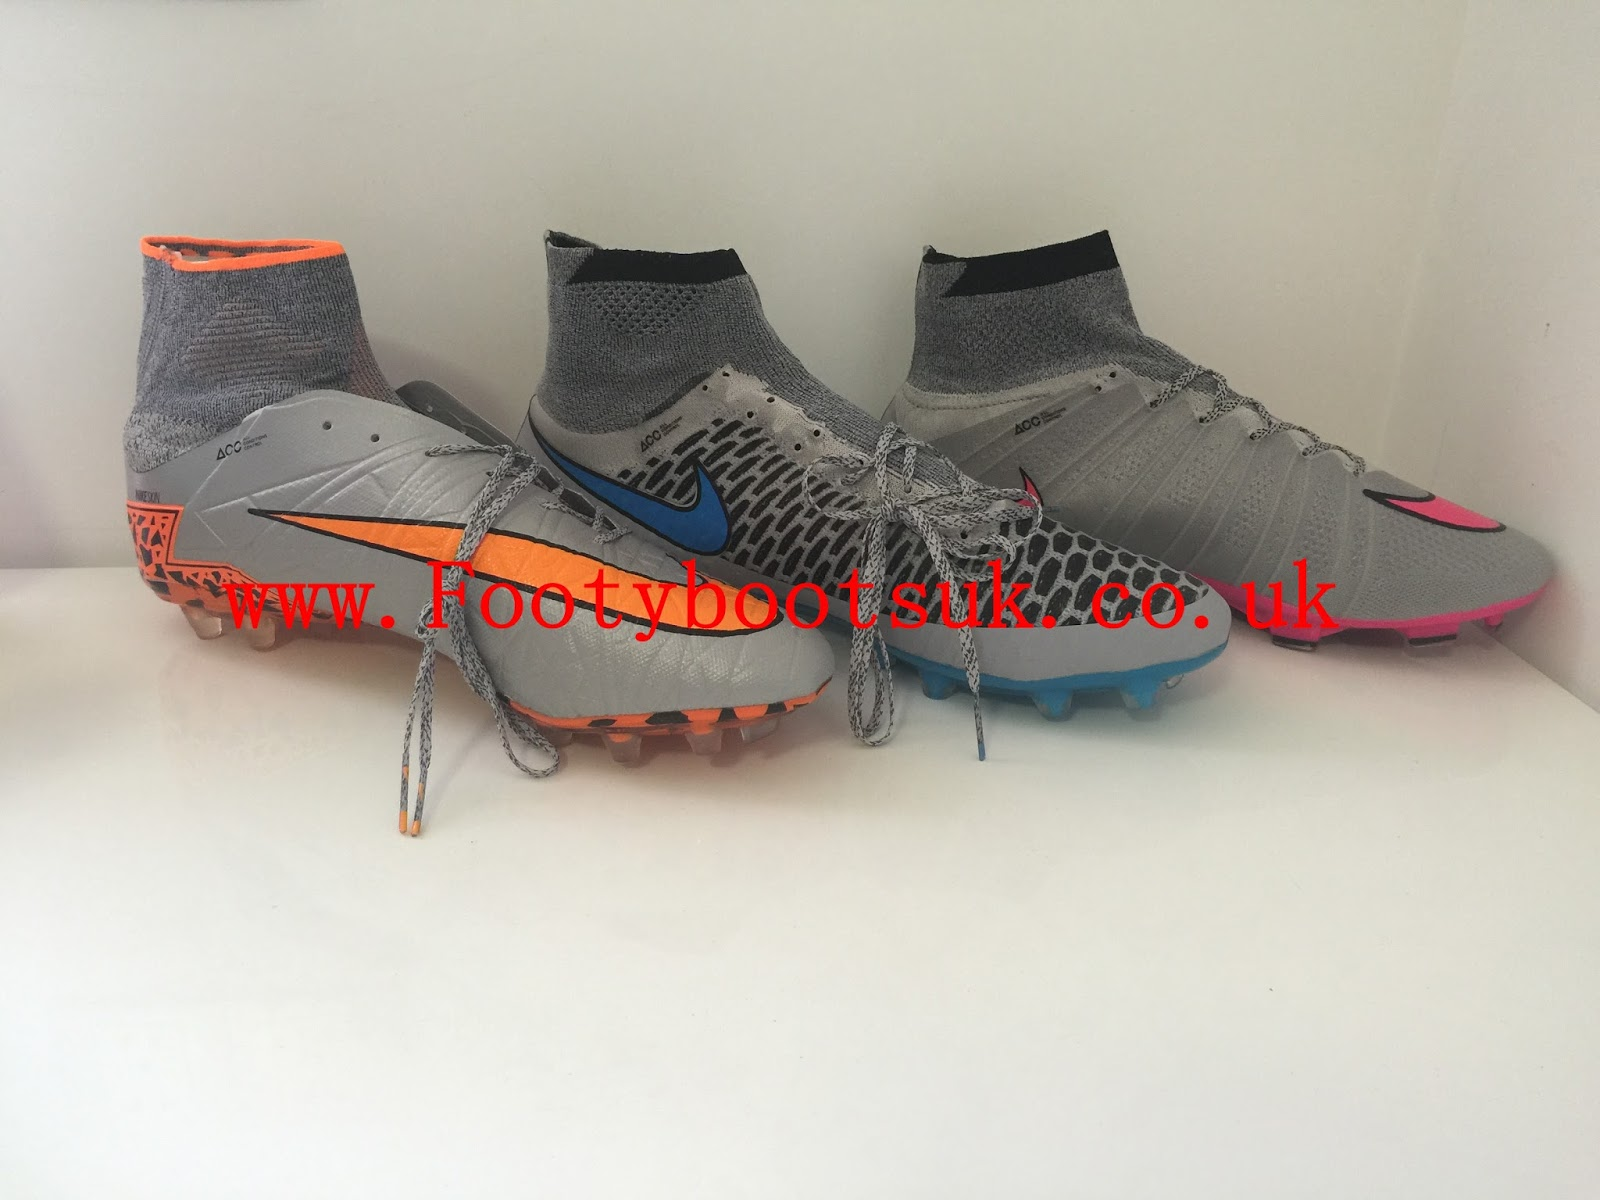 premium selection 7cdb0 ab9ea Pro-football-boots.co.uk: June 2015